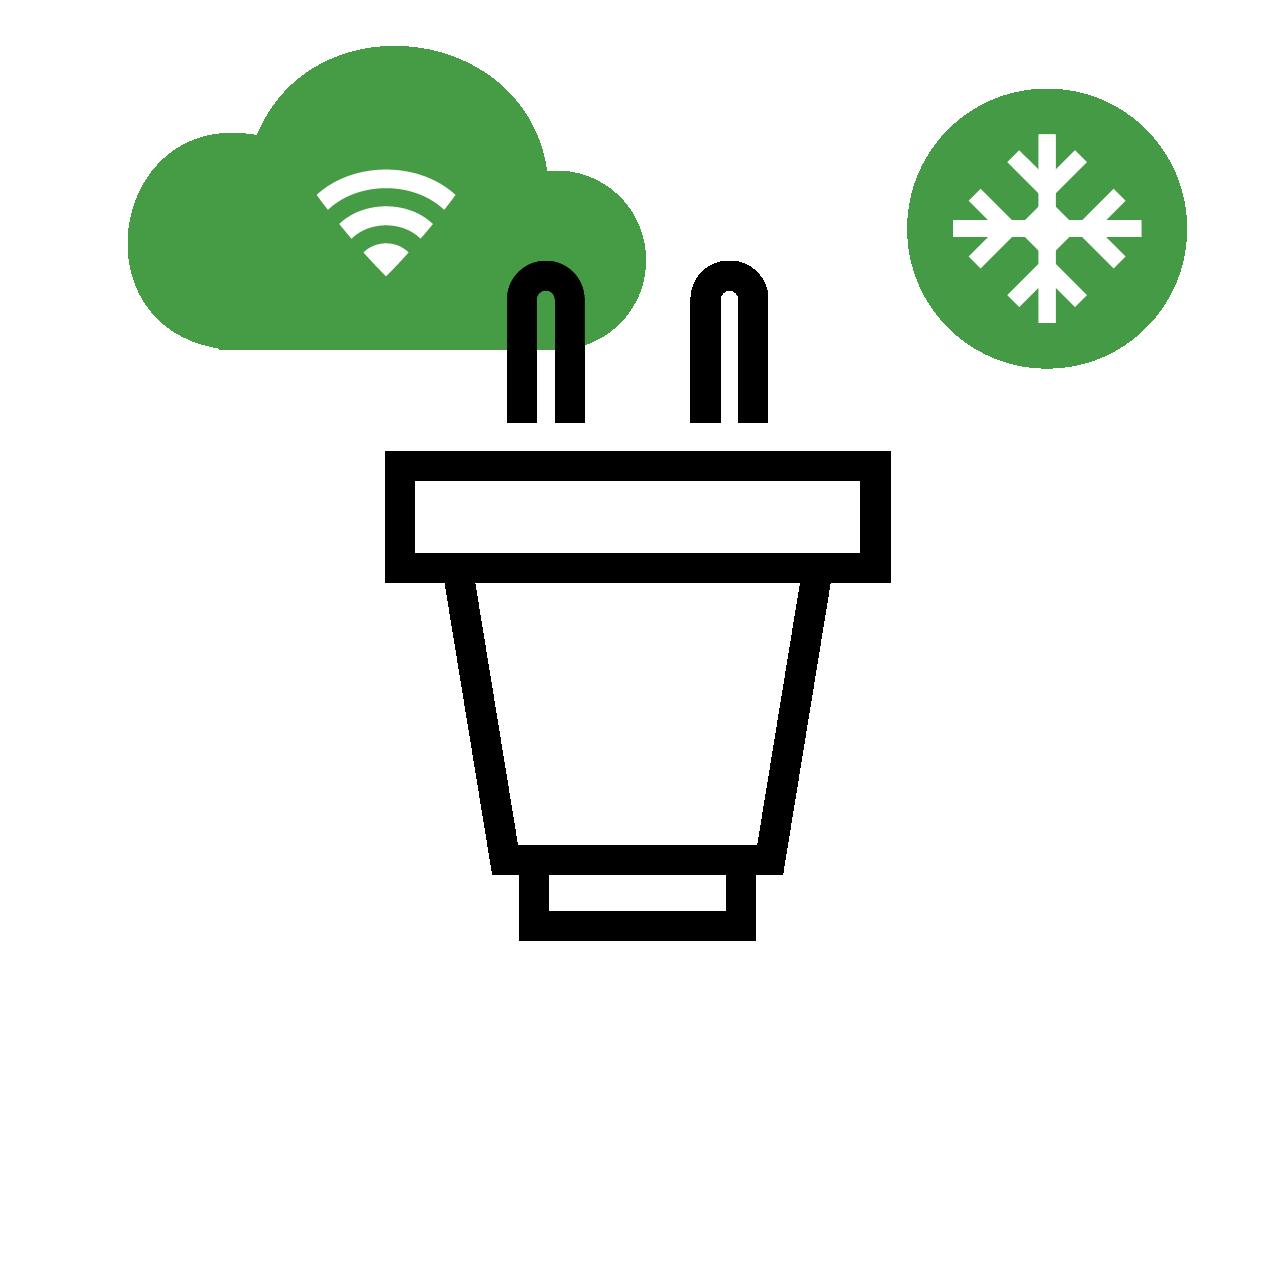 Energy management icon, temperature controls, thermostat